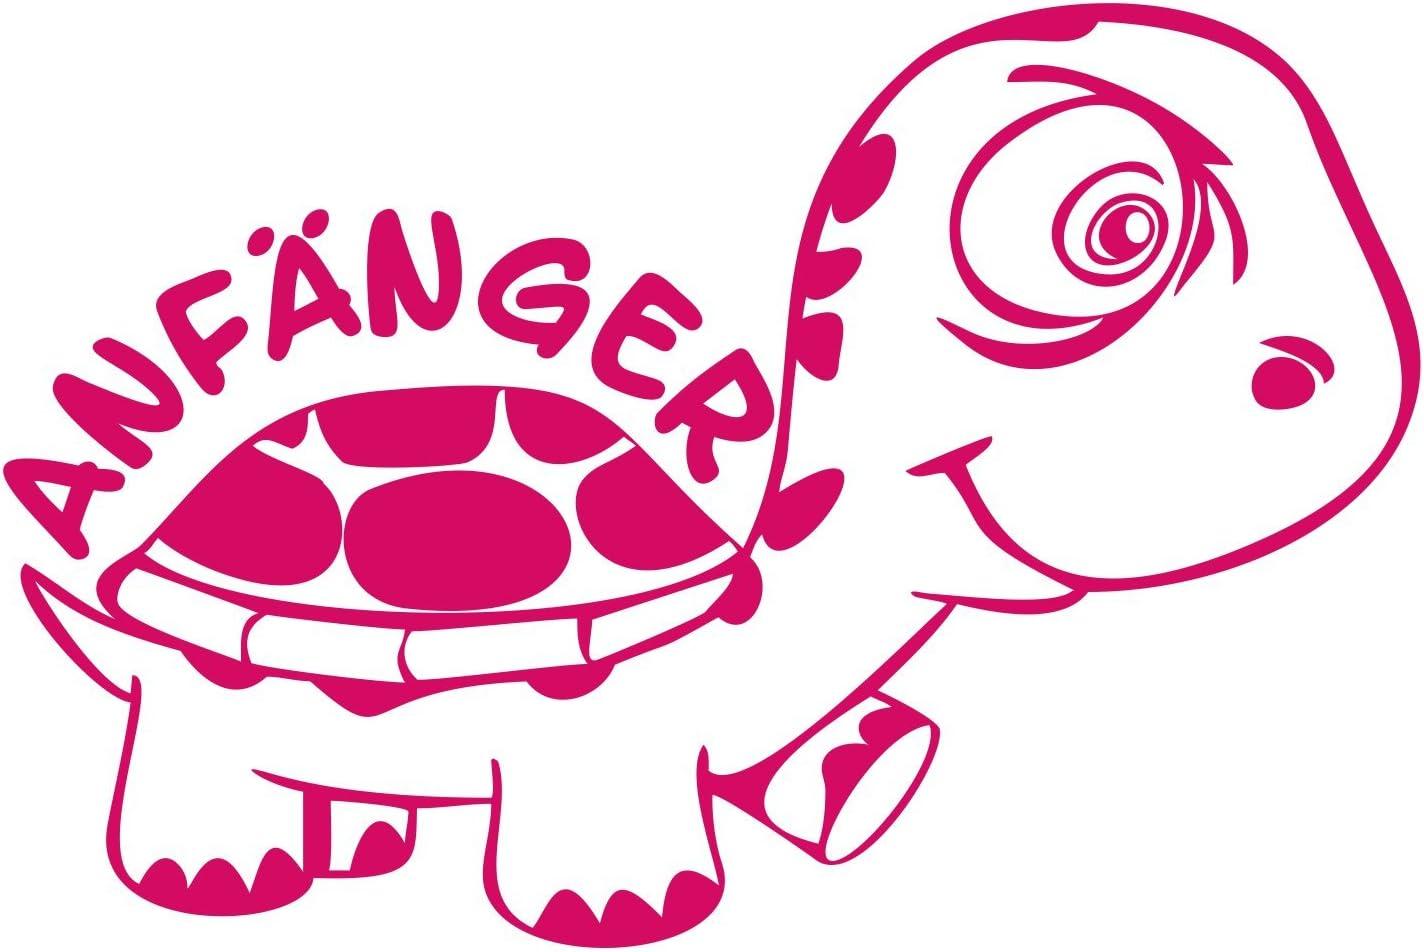 Folistick Anfänger Turtle Schildkröte Aufkleber Fahranfänger Autoaufkleber 24x16 Cm Ausführung Rechts Pink Auto